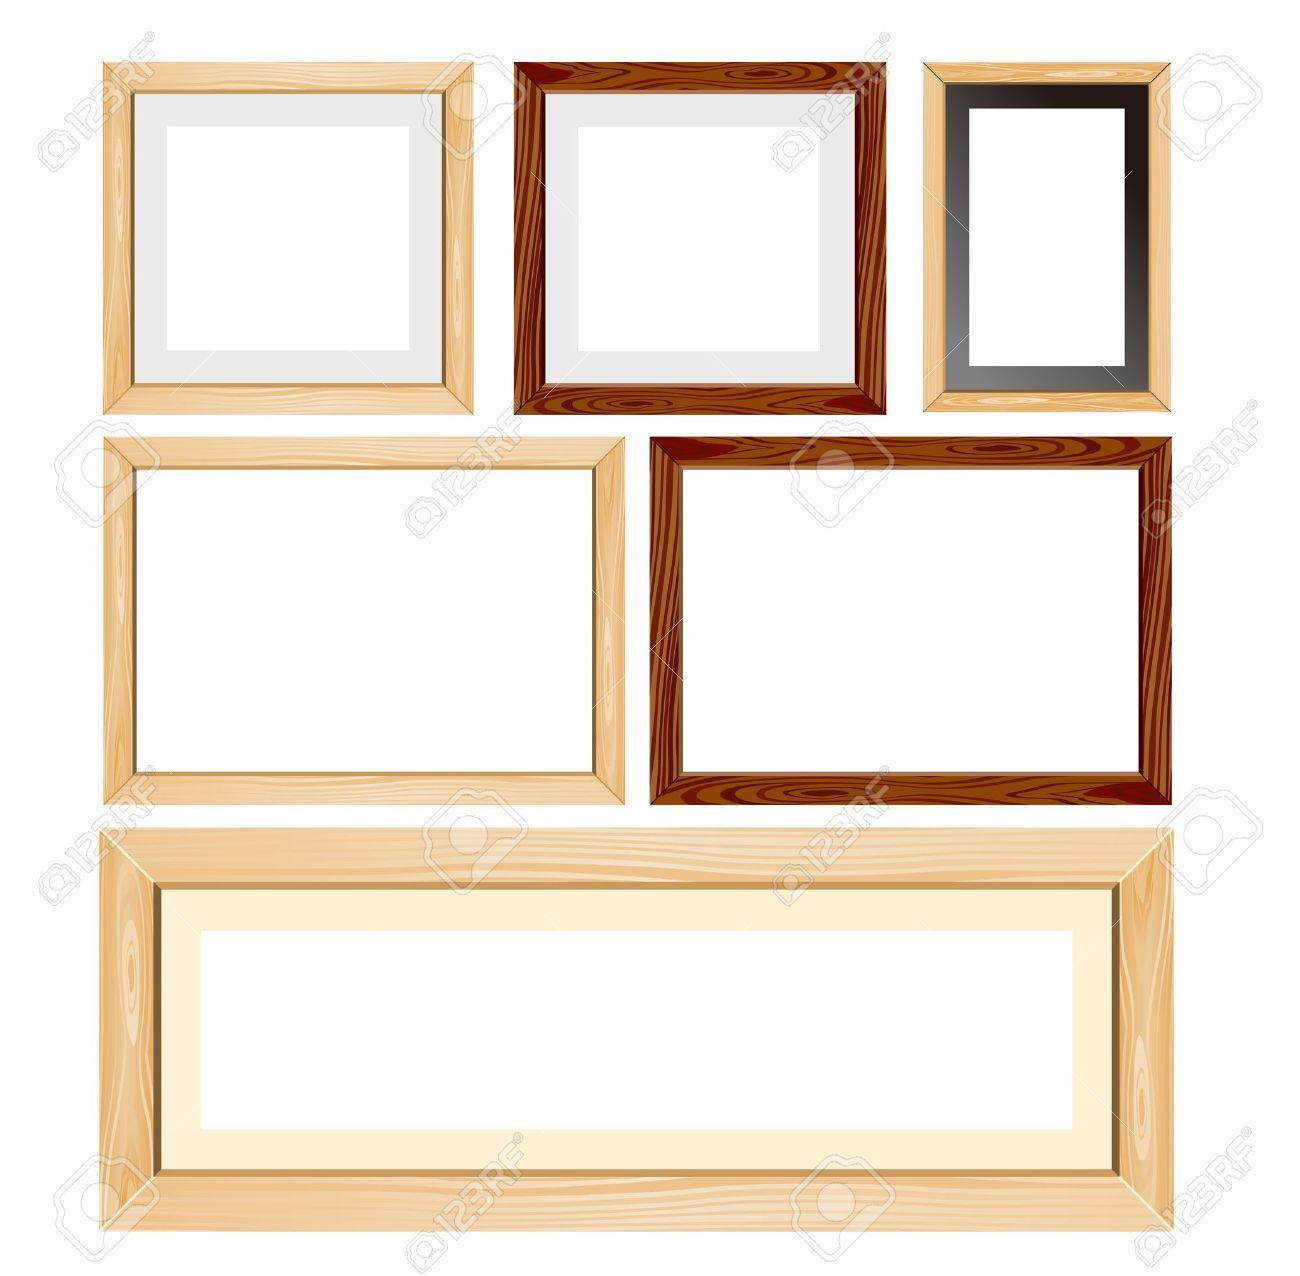 Wood frames set free vector - Wooden Frame Photo Frame Wood Frames Set Vector